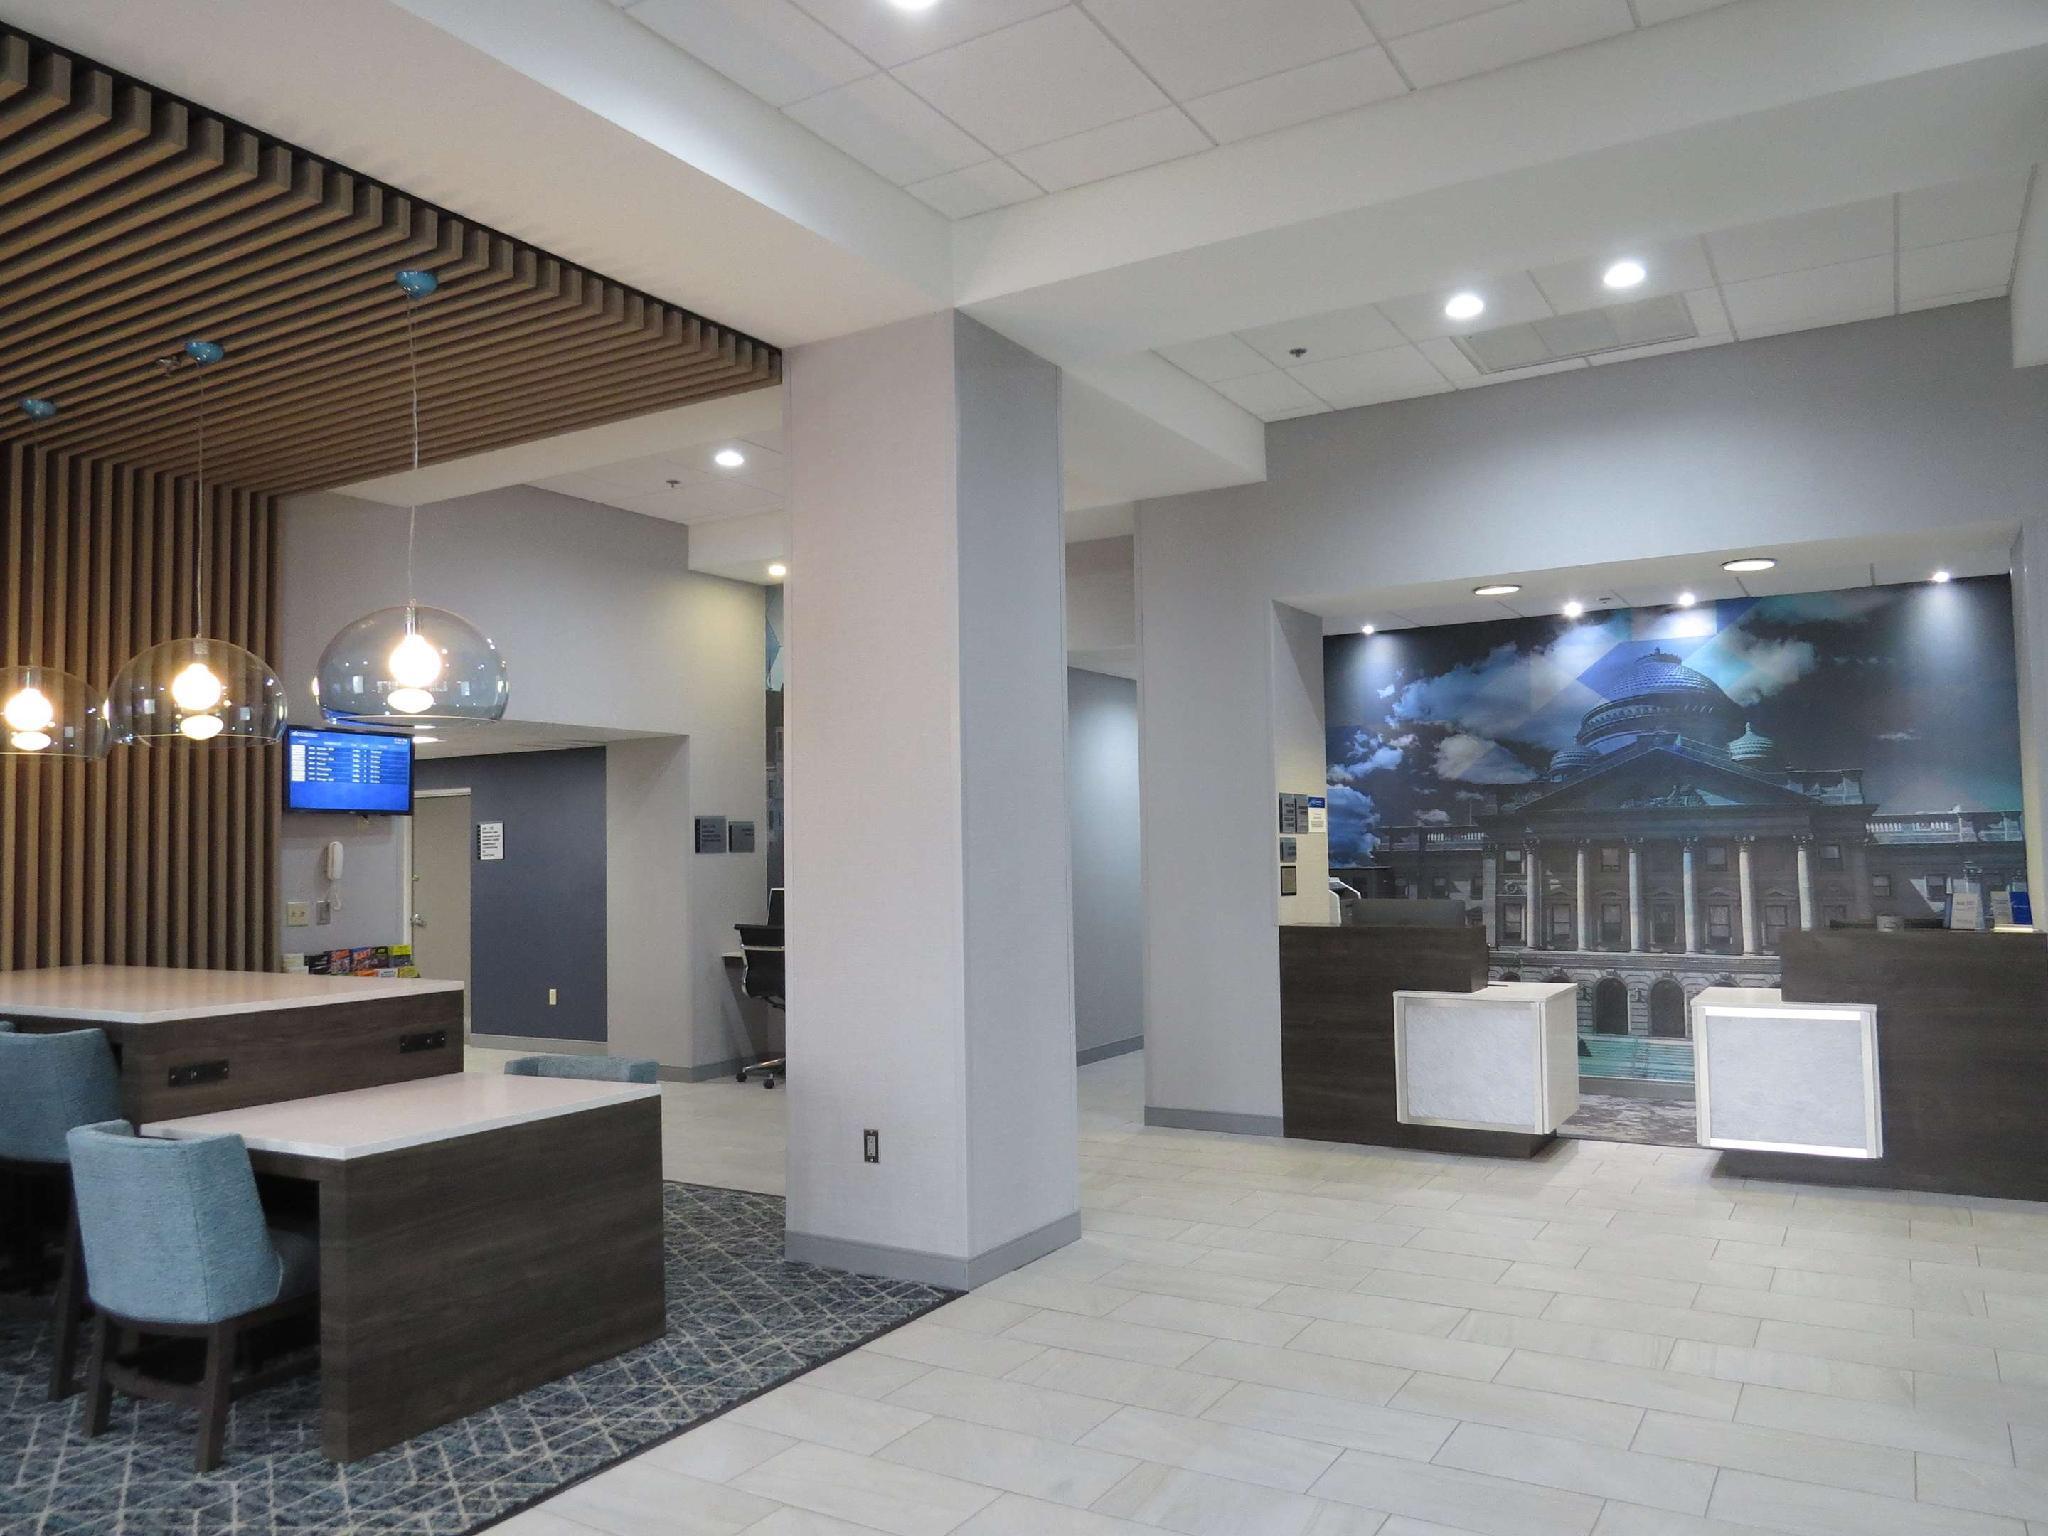 Best Western Plus Wilkes Barre-Scranton Airport Hotel, Luzerne